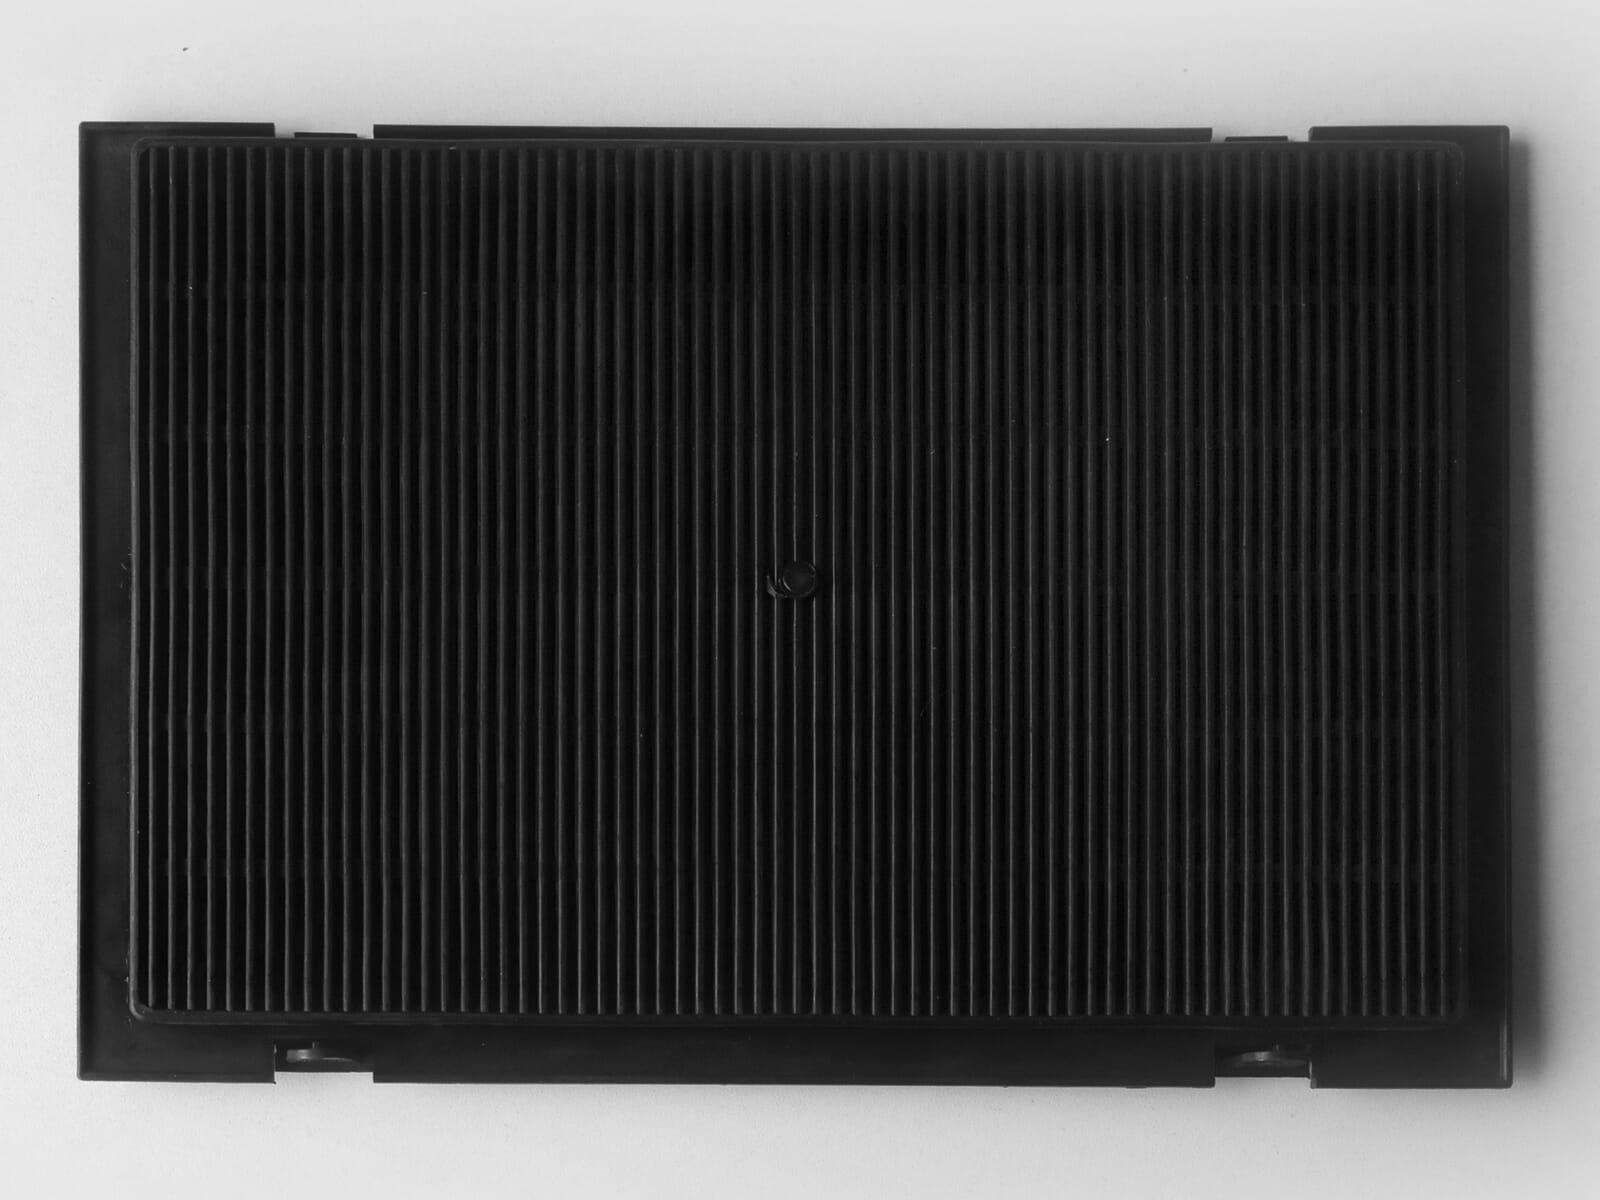 Oranier KSC 800 Aktiv-Kohlefilter Sparset (4 Stück)